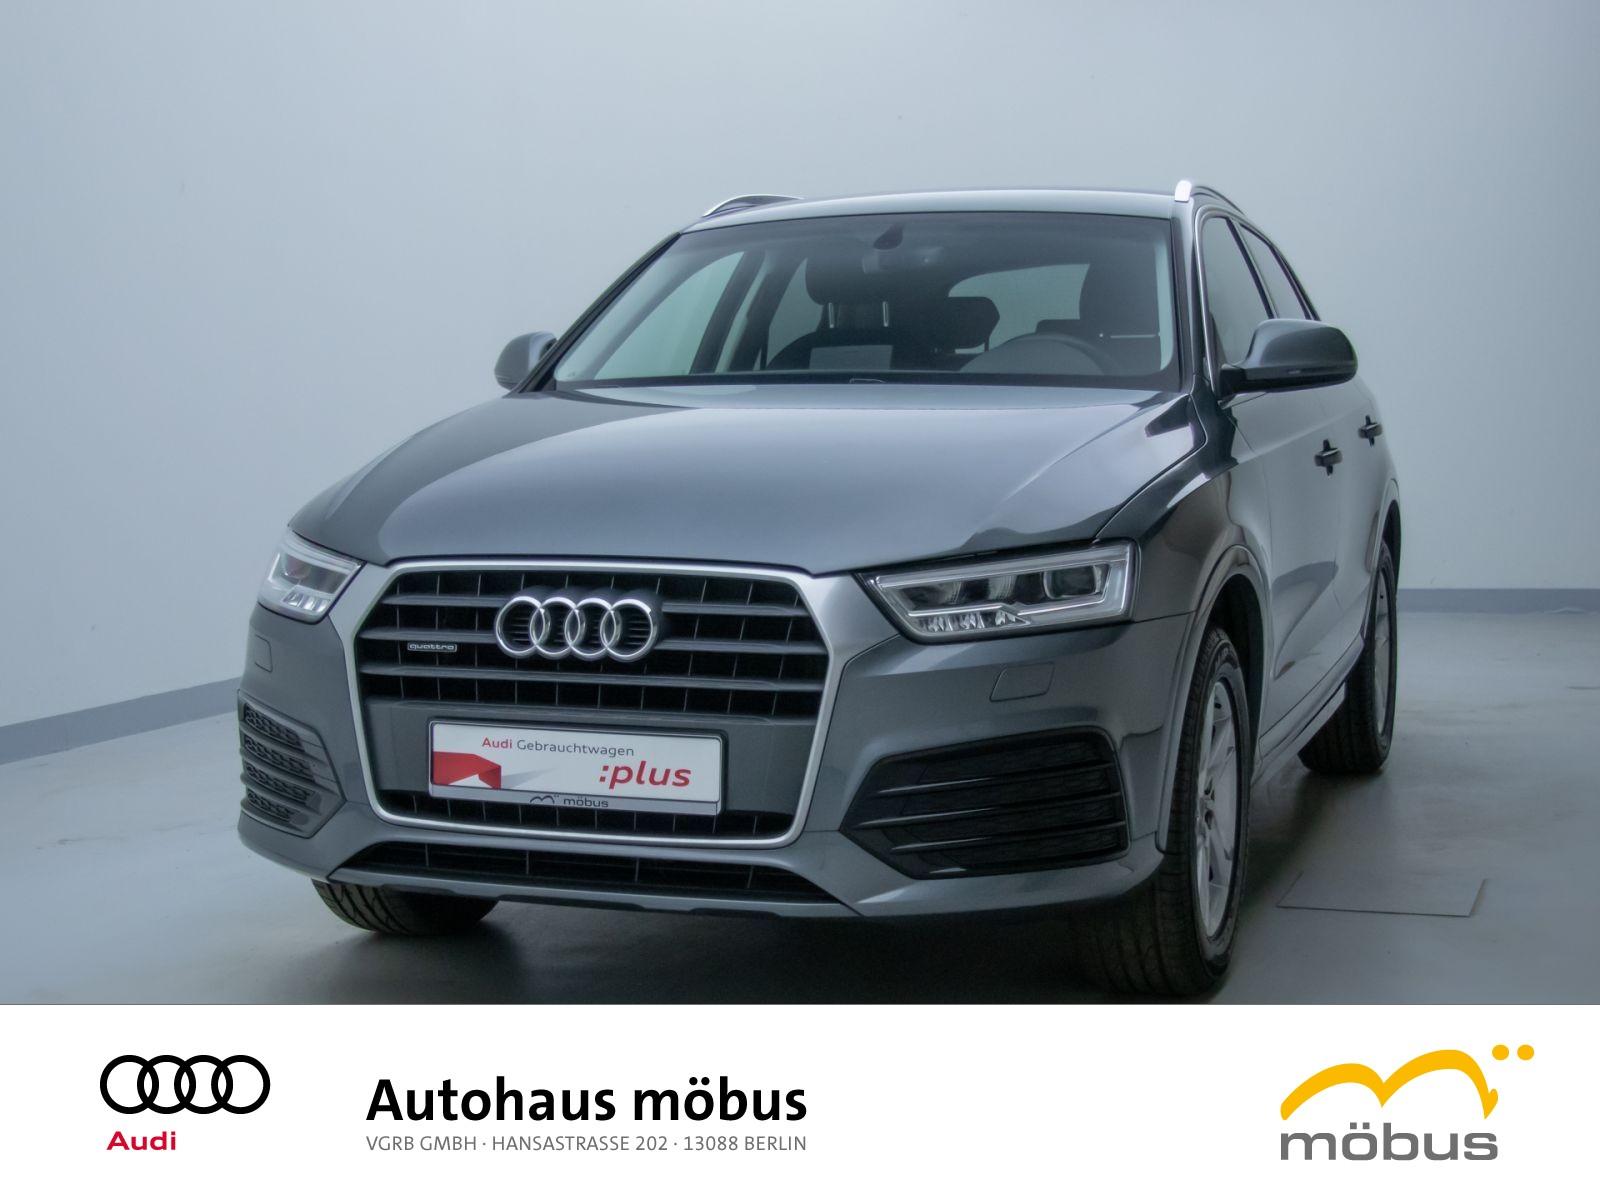 Audi Q3 sport 2.0 TDI quattro *6-GANG*AHZ*GRA*LED*BT*, Jahr 2017, Diesel